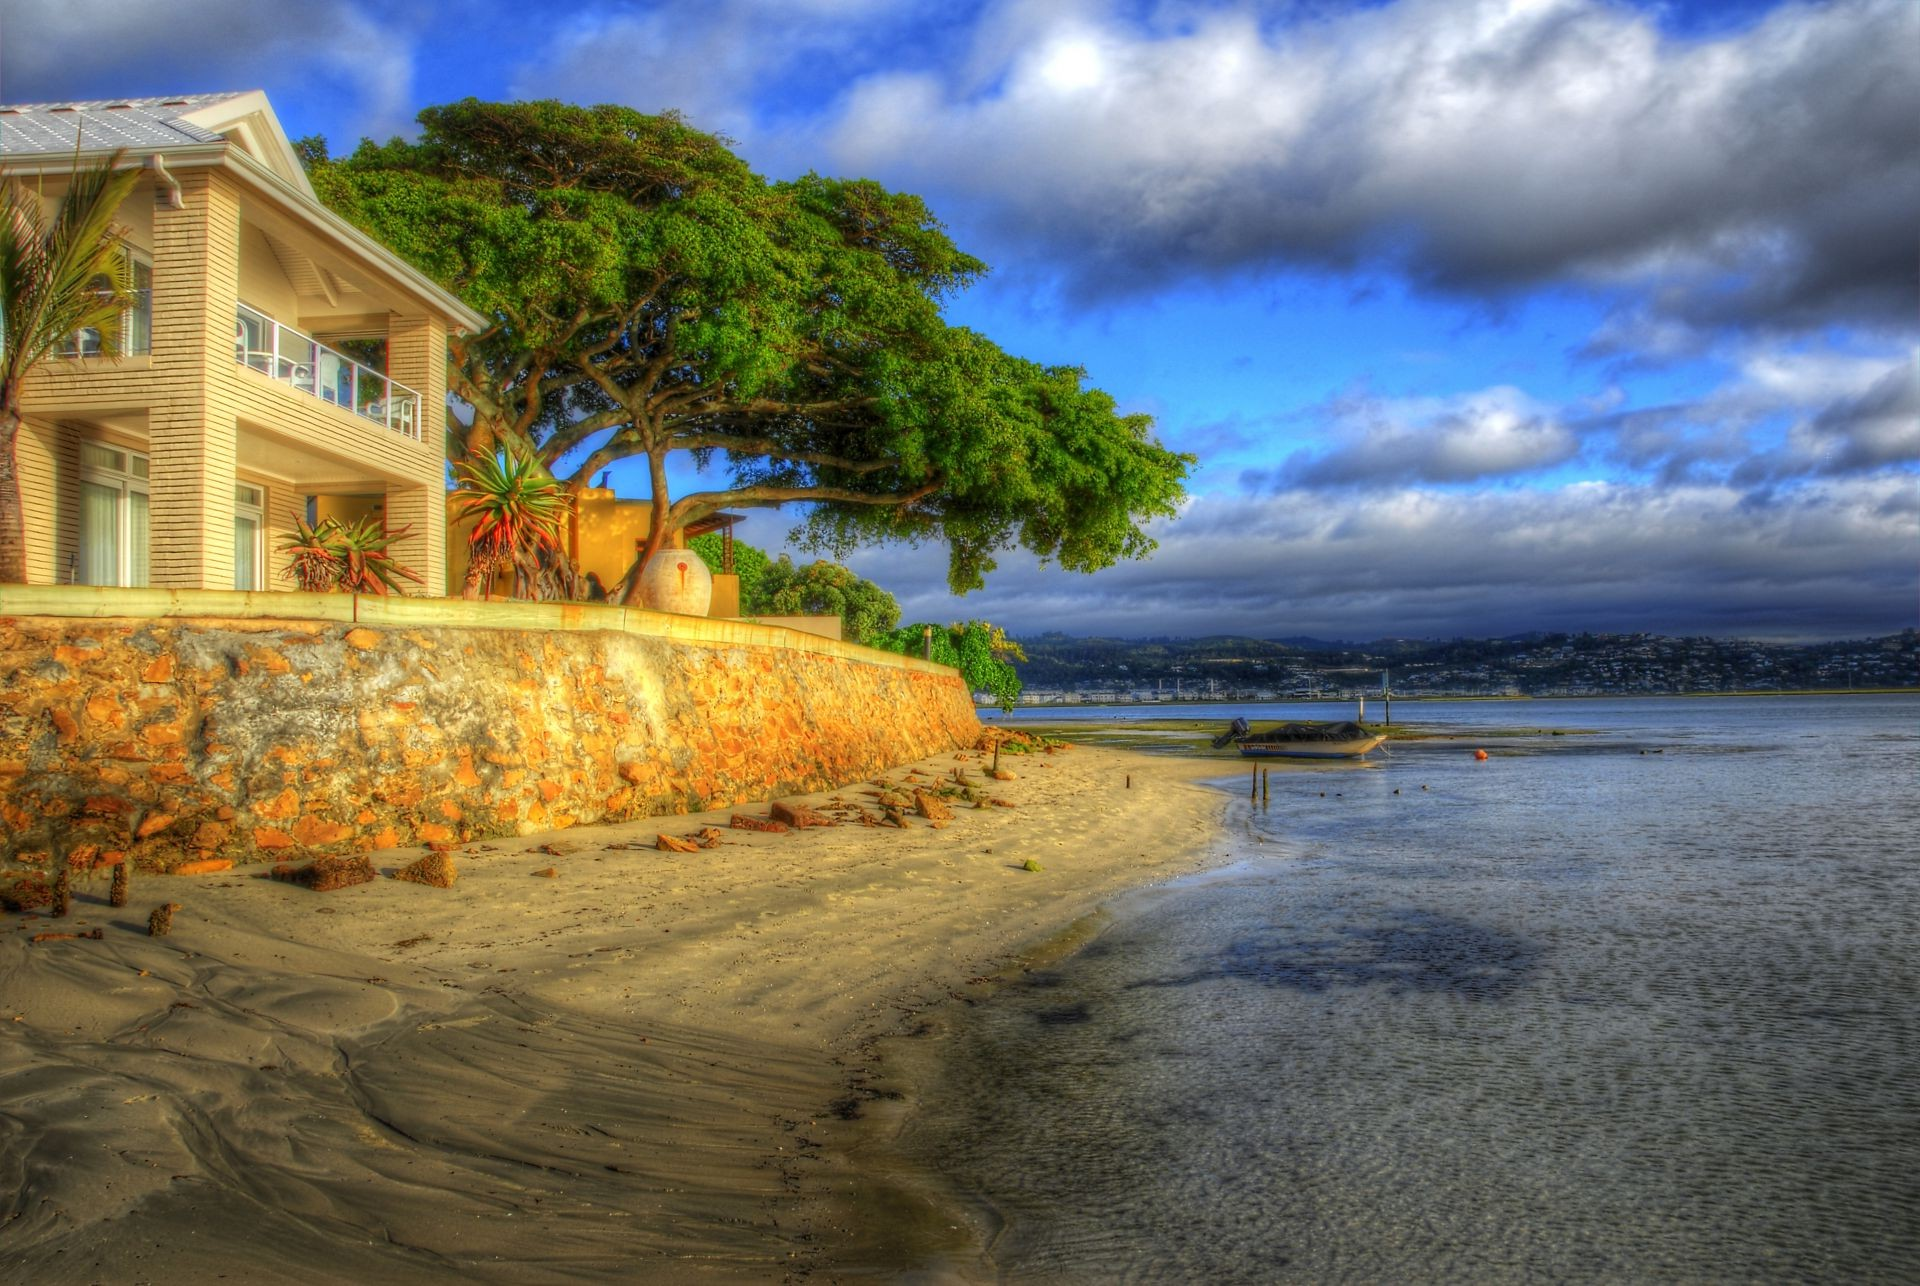 Картинки про, картинки красивый дом у моря